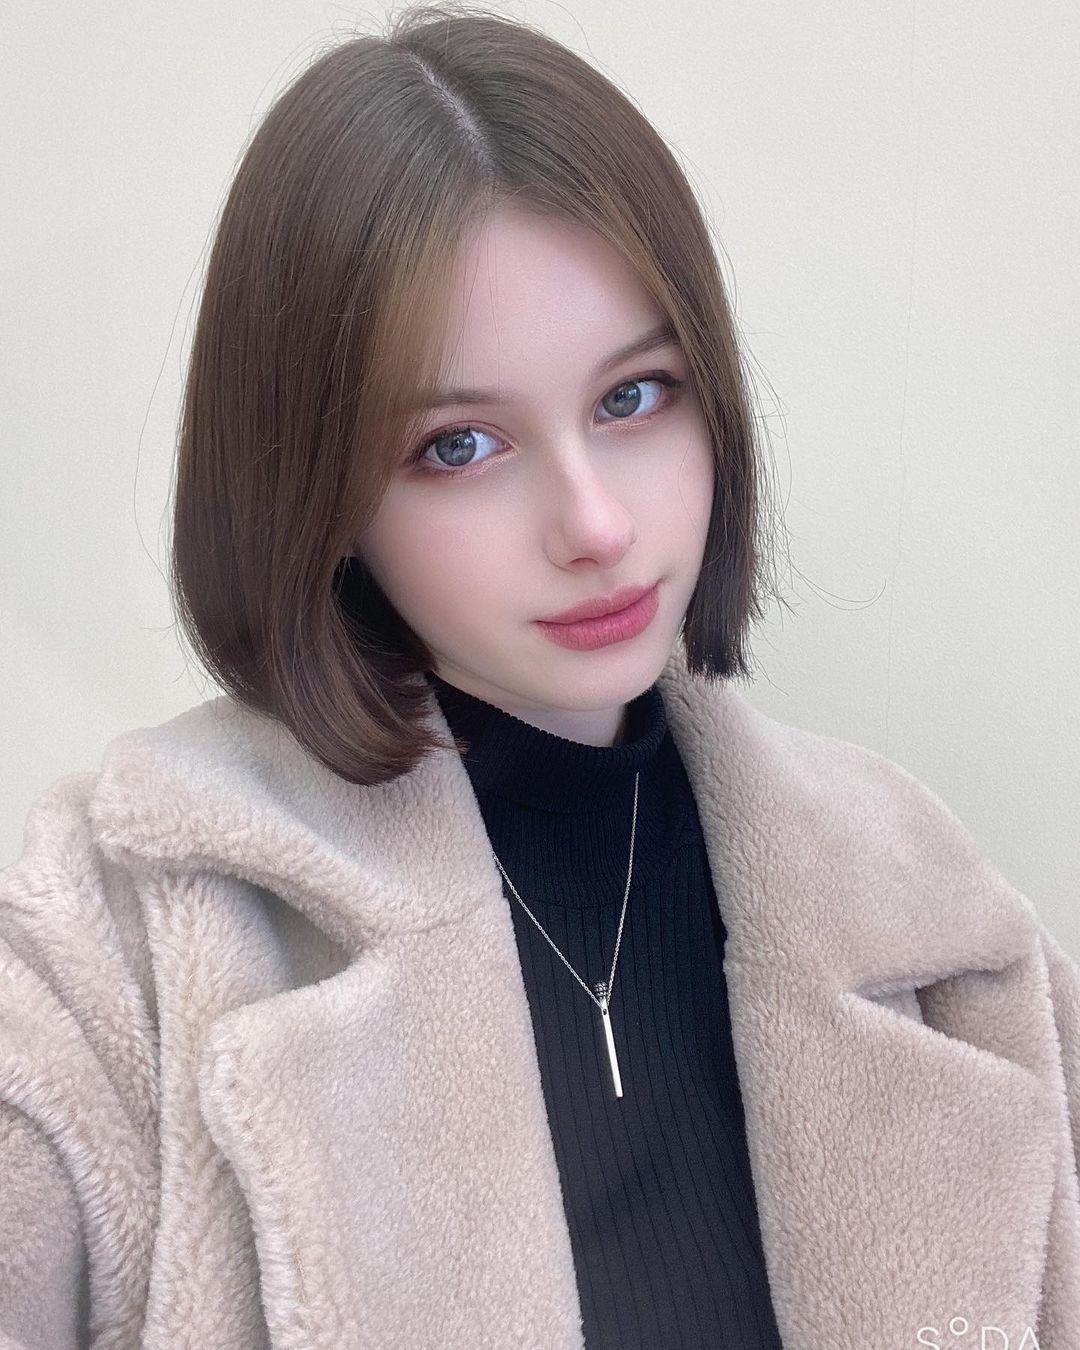 Darina-Brodskaya-Wallpapers-Insta-Fit-Bio-7